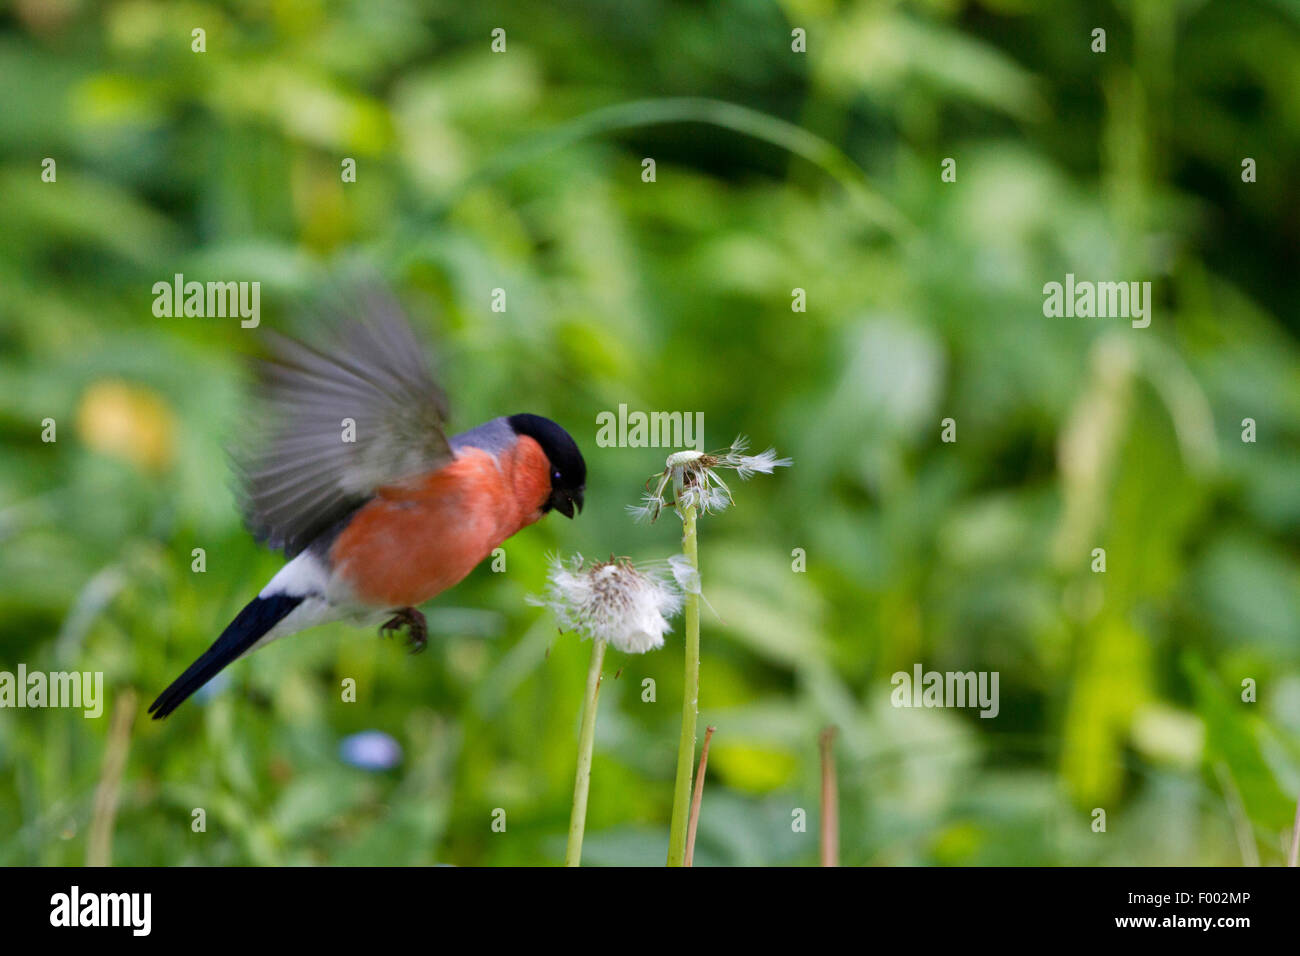 bullfinch, Eurasian bullfinch, northern bullfinch (Pyrrhula pyrrhula), male approaching dandelion seed head, Germany, - Stock Image